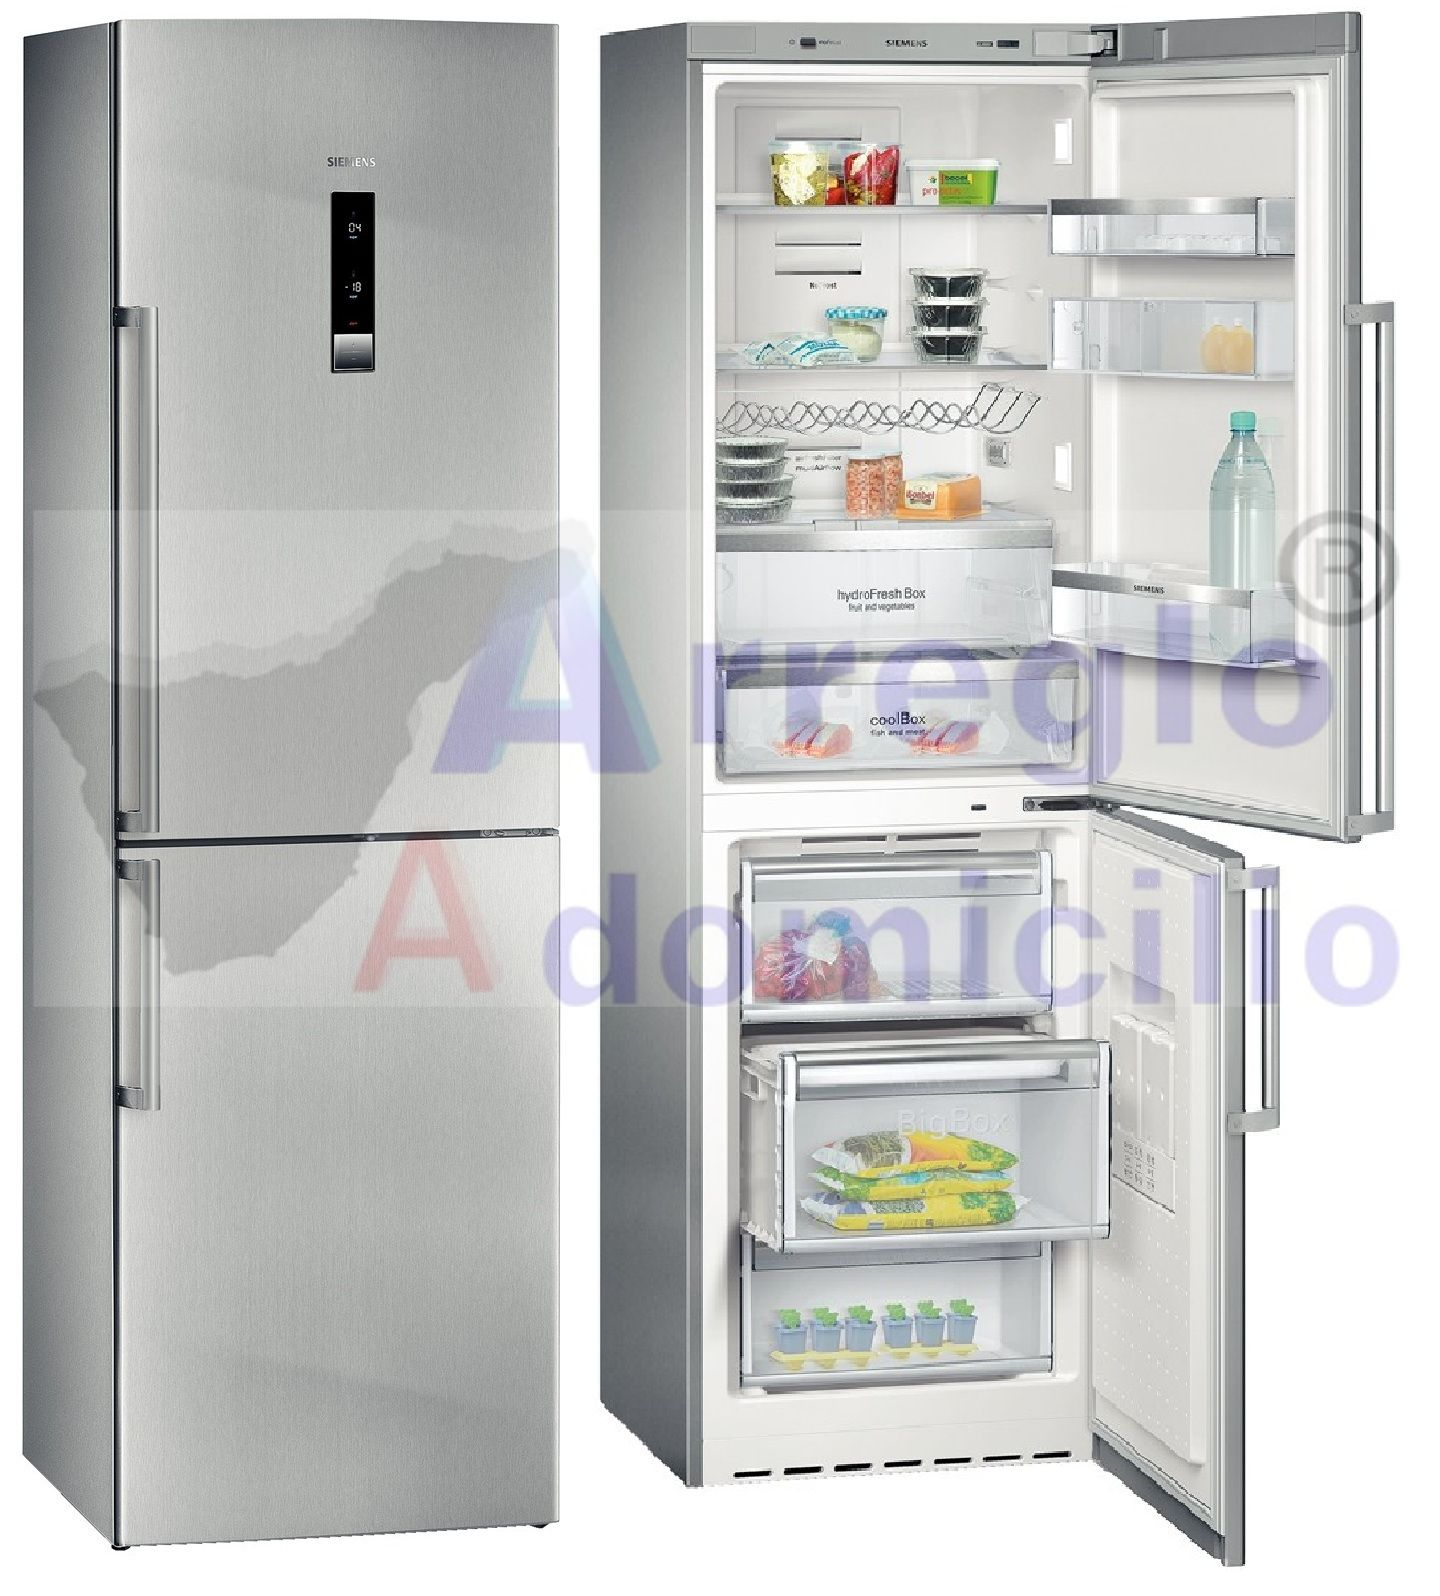 tecnico de frigorificos tenerife sur